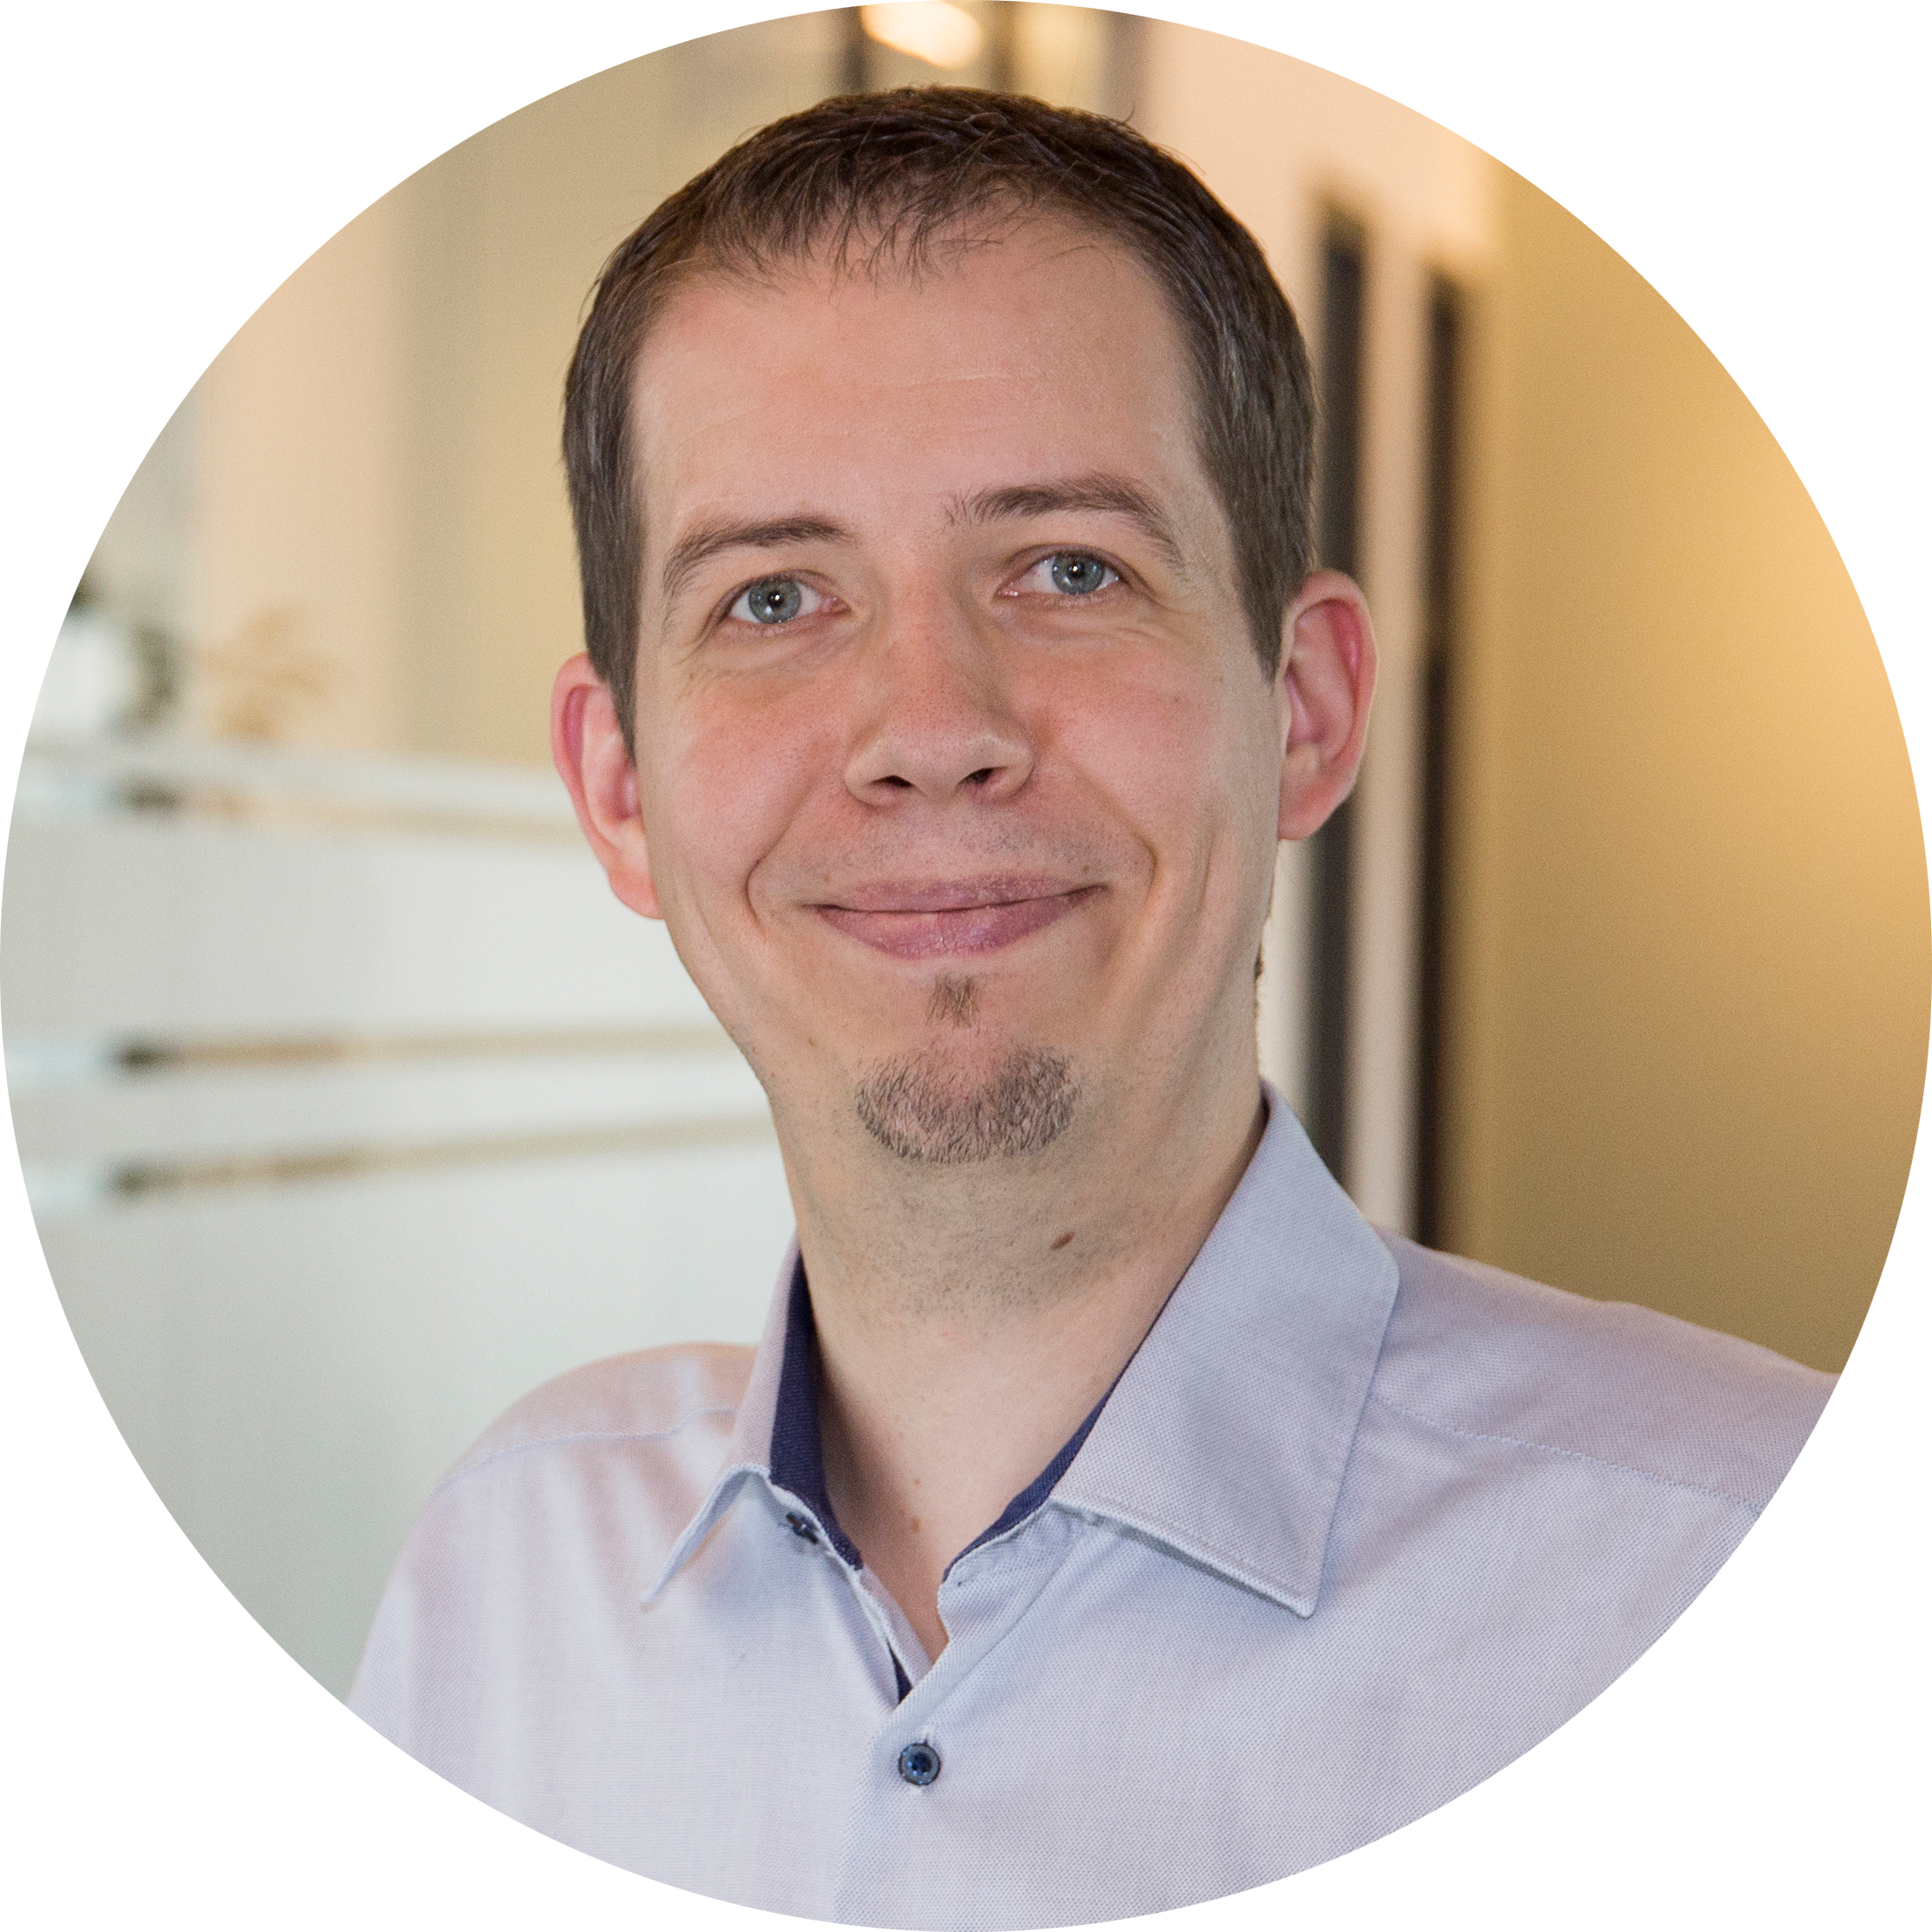 Dr. David Schmoldt